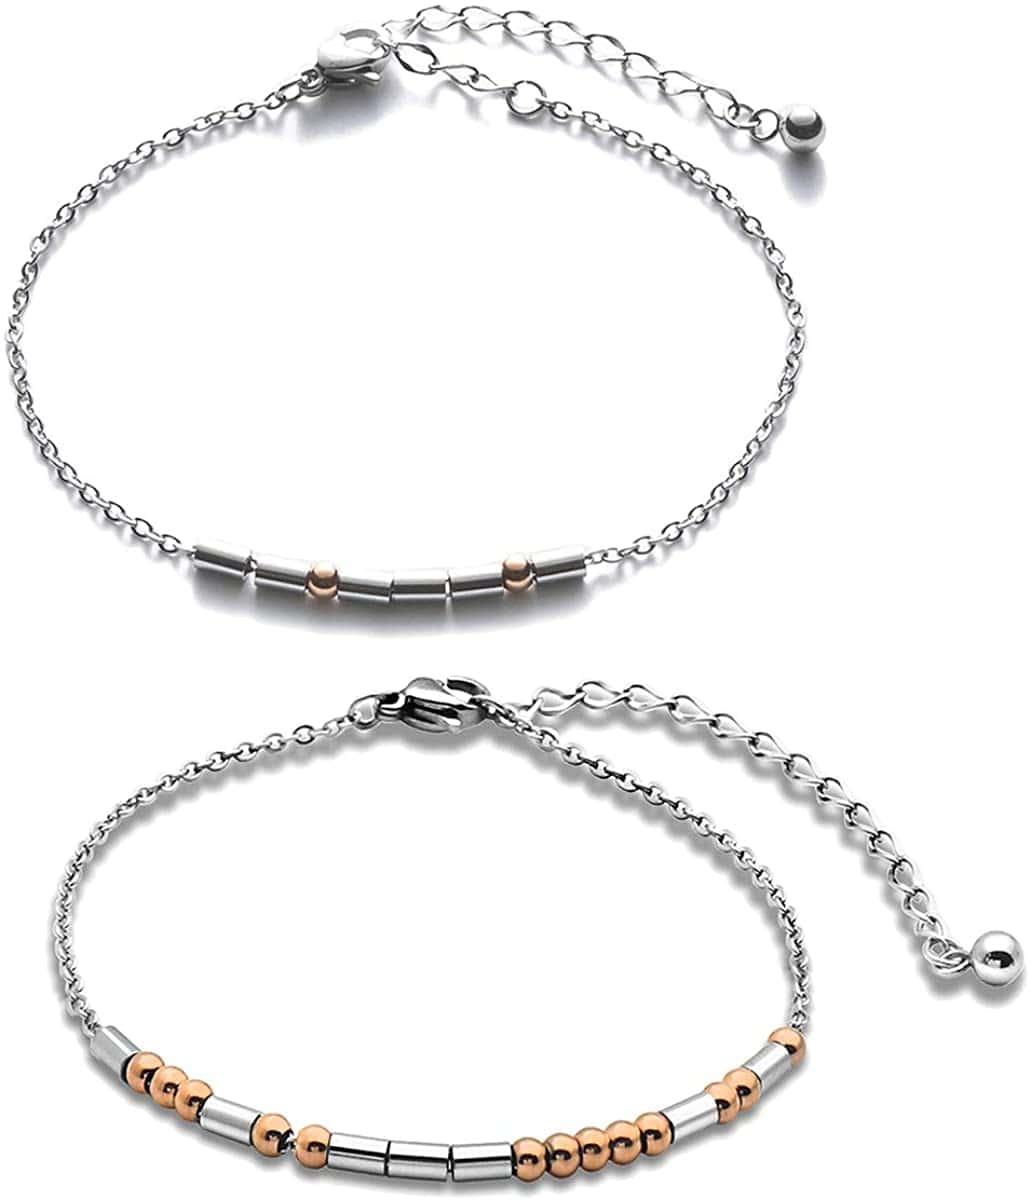 Personalised Morse Code Bracelet - Jingmaruo